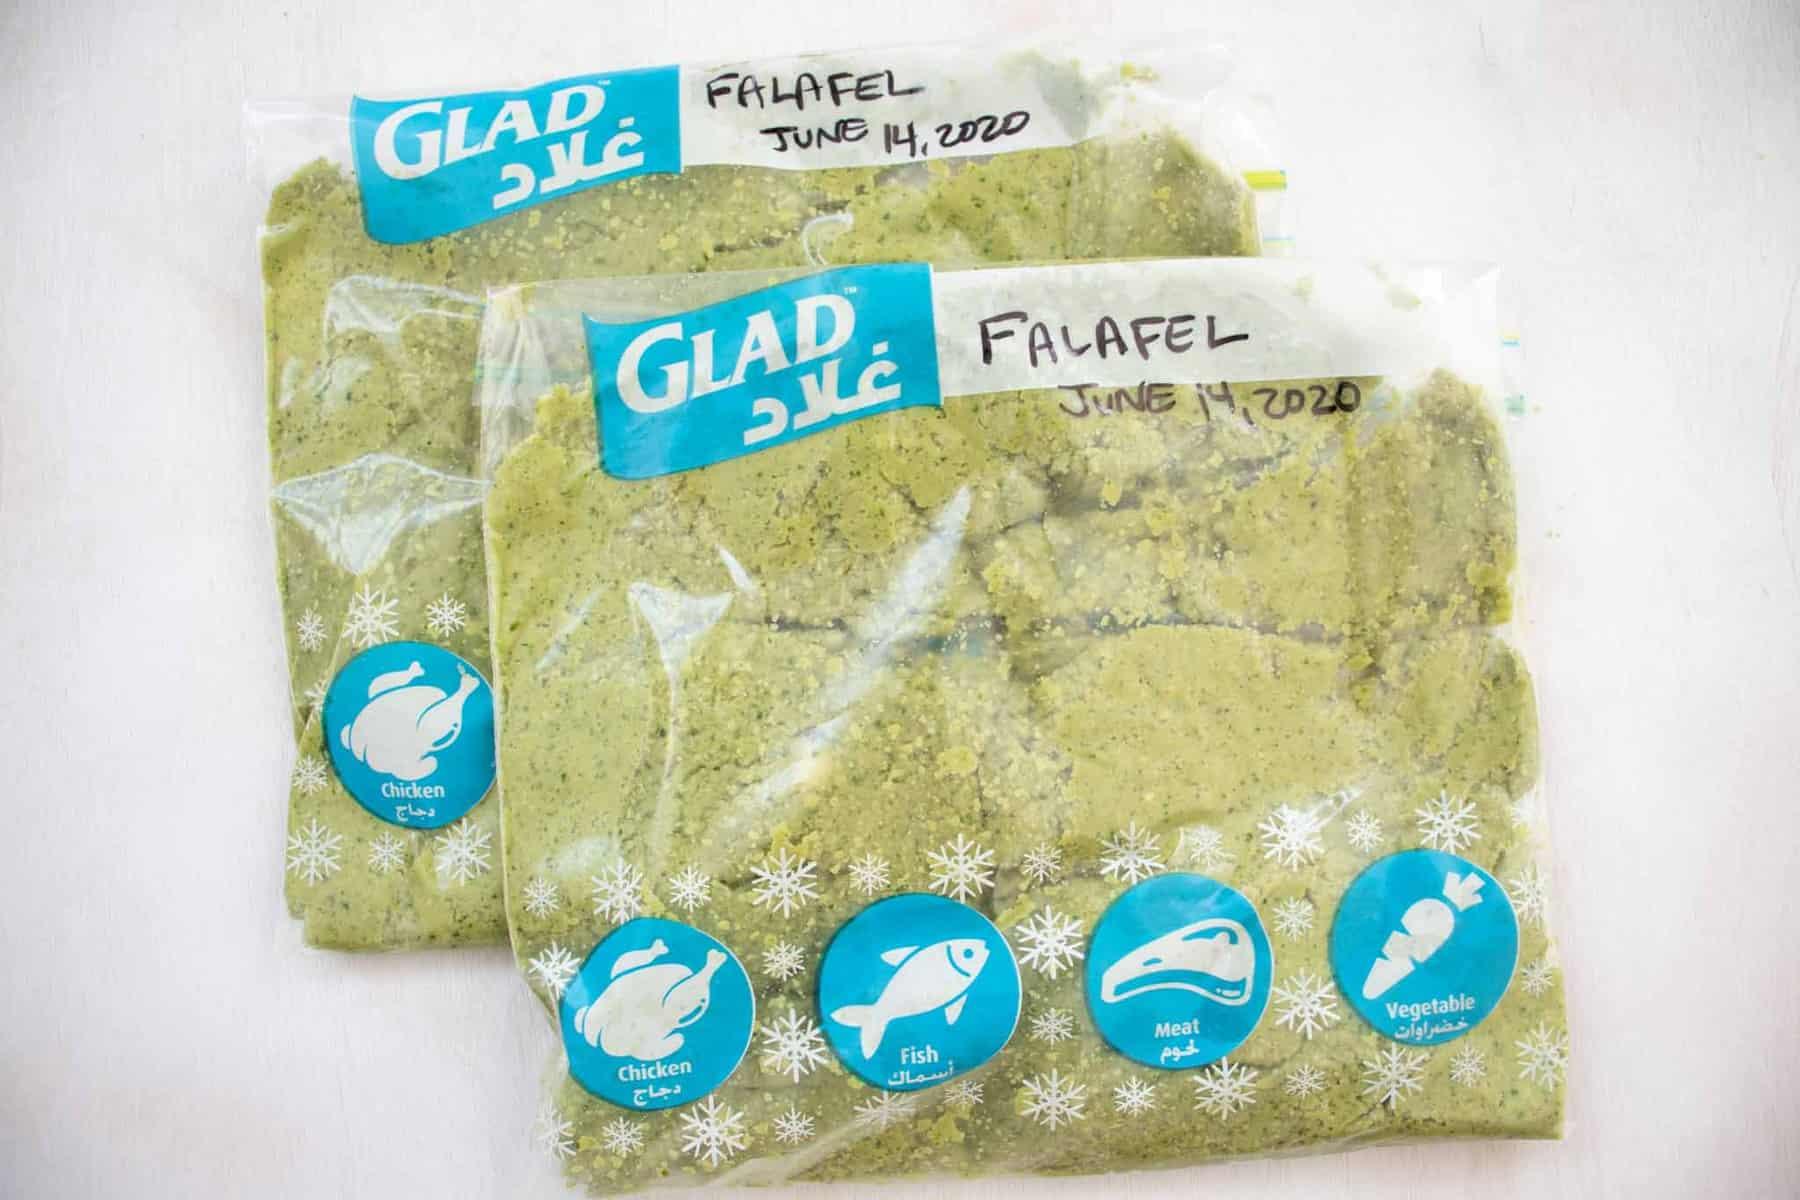 falafel in storage bags